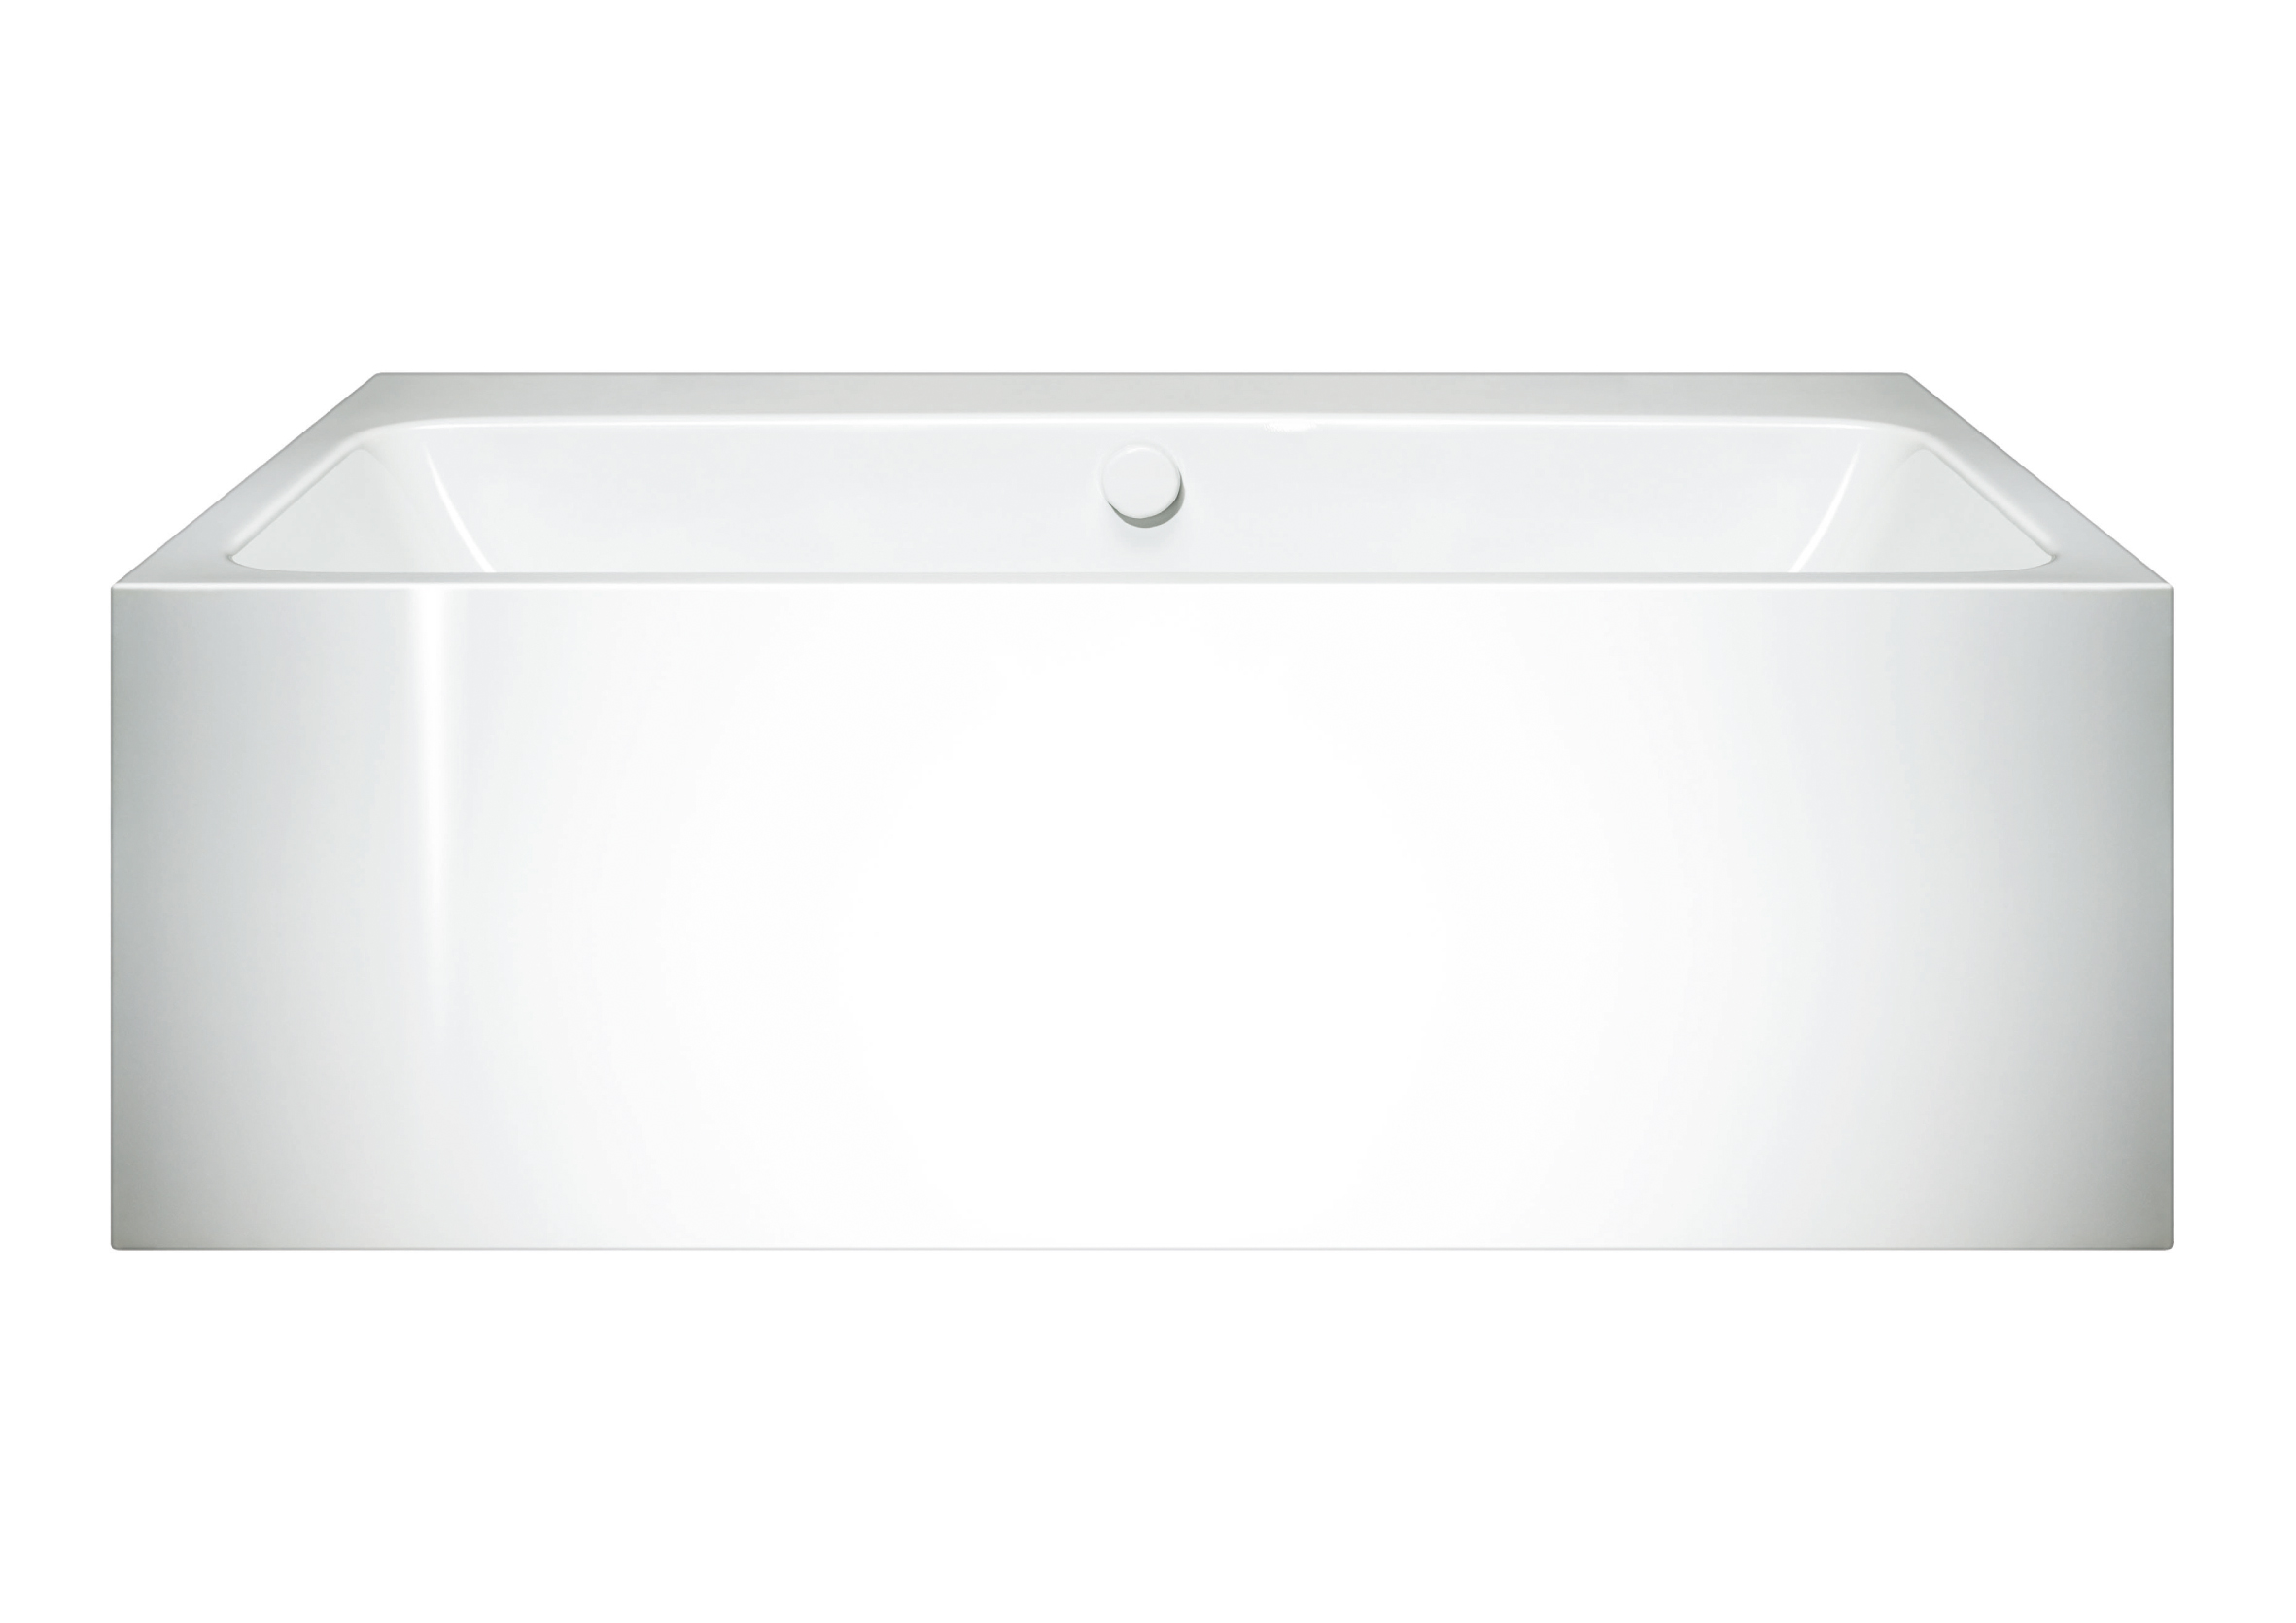 bathroom design trends from kaldewei the kitchen and. Black Bedroom Furniture Sets. Home Design Ideas